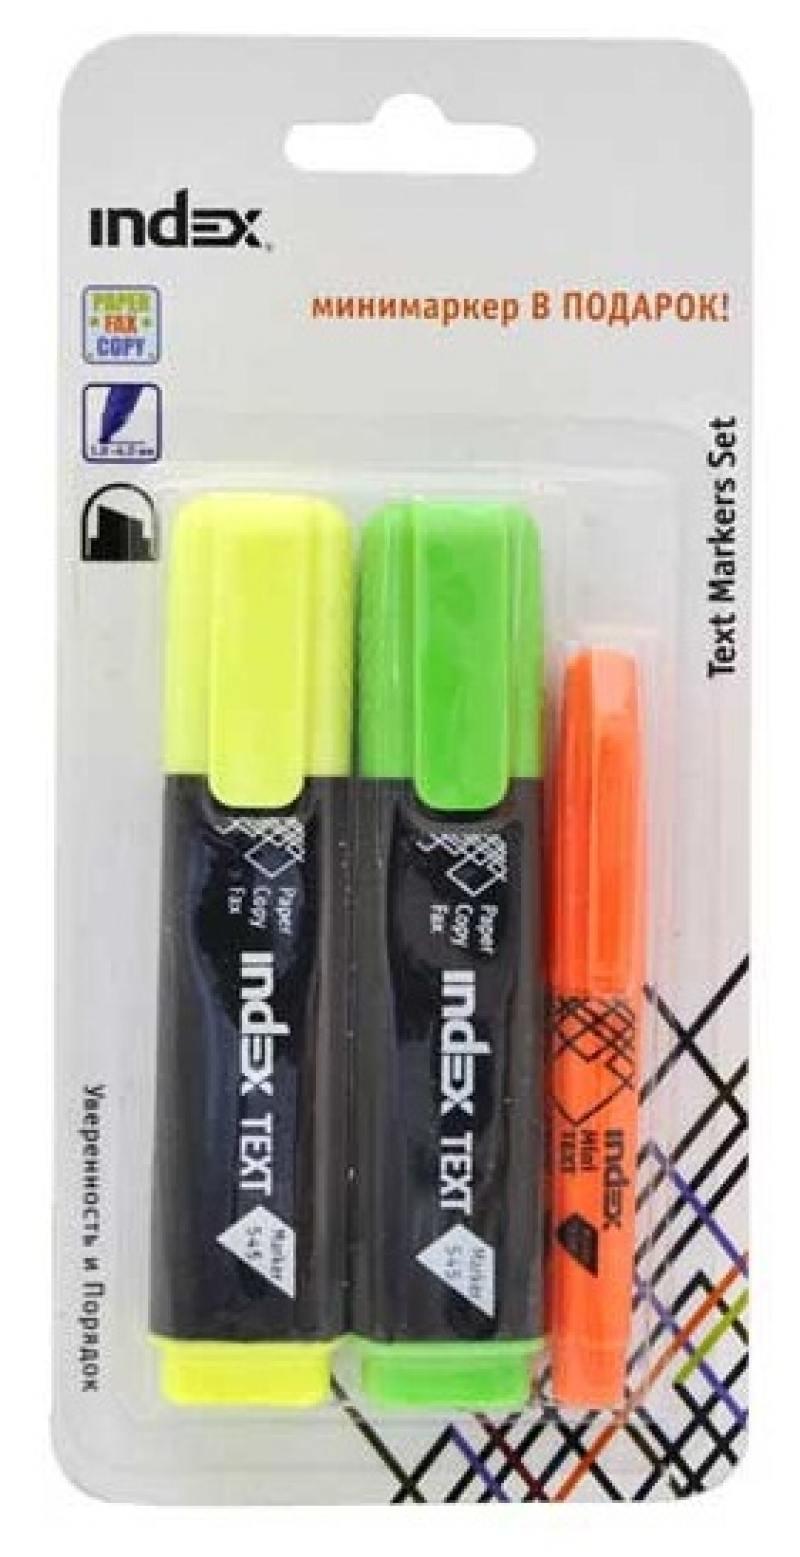 Набор маркеров Index IMH545/2/P 1 мм 3 шт разноцветный IMH545/2/P текстмаркер index index imh545 1 мм зеленый